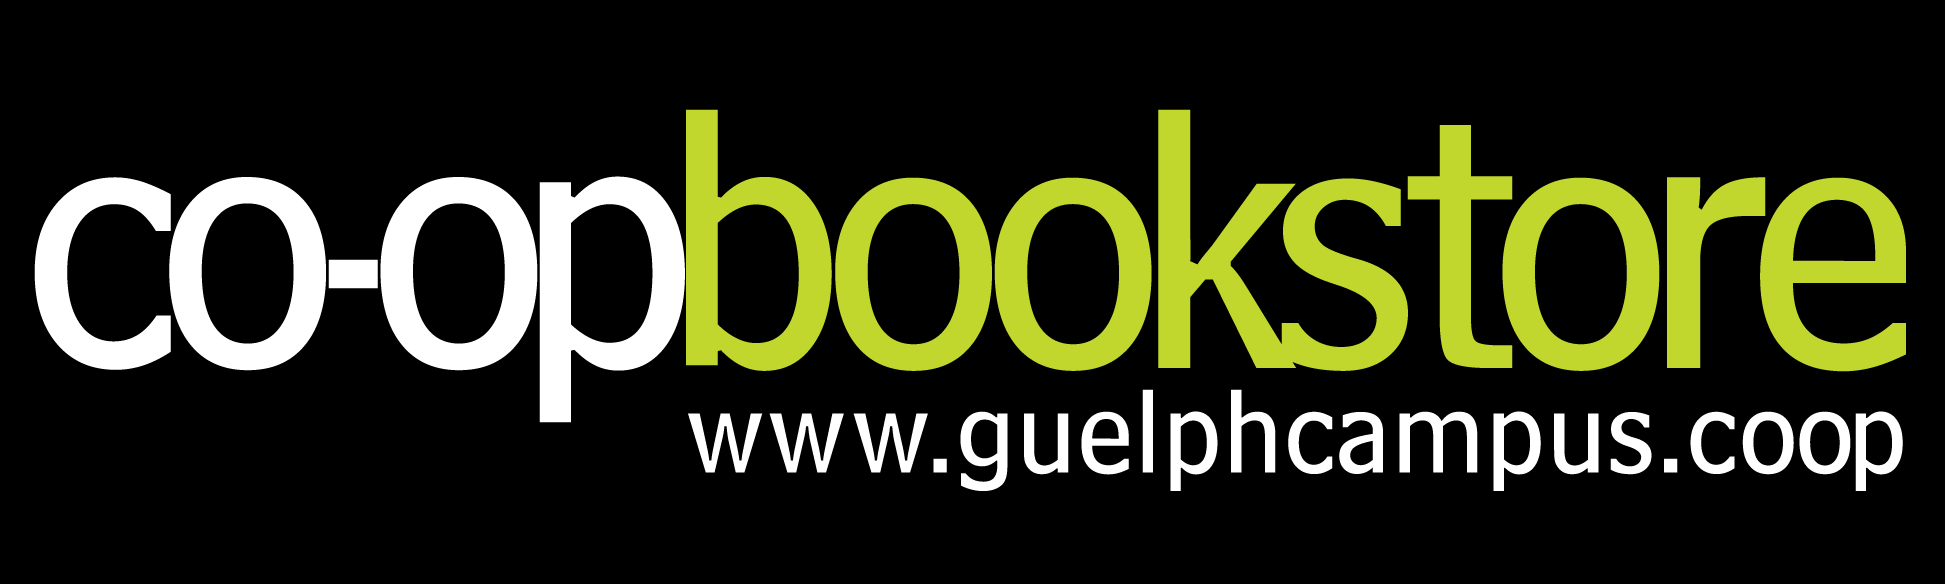 bookstore logo web 09.png